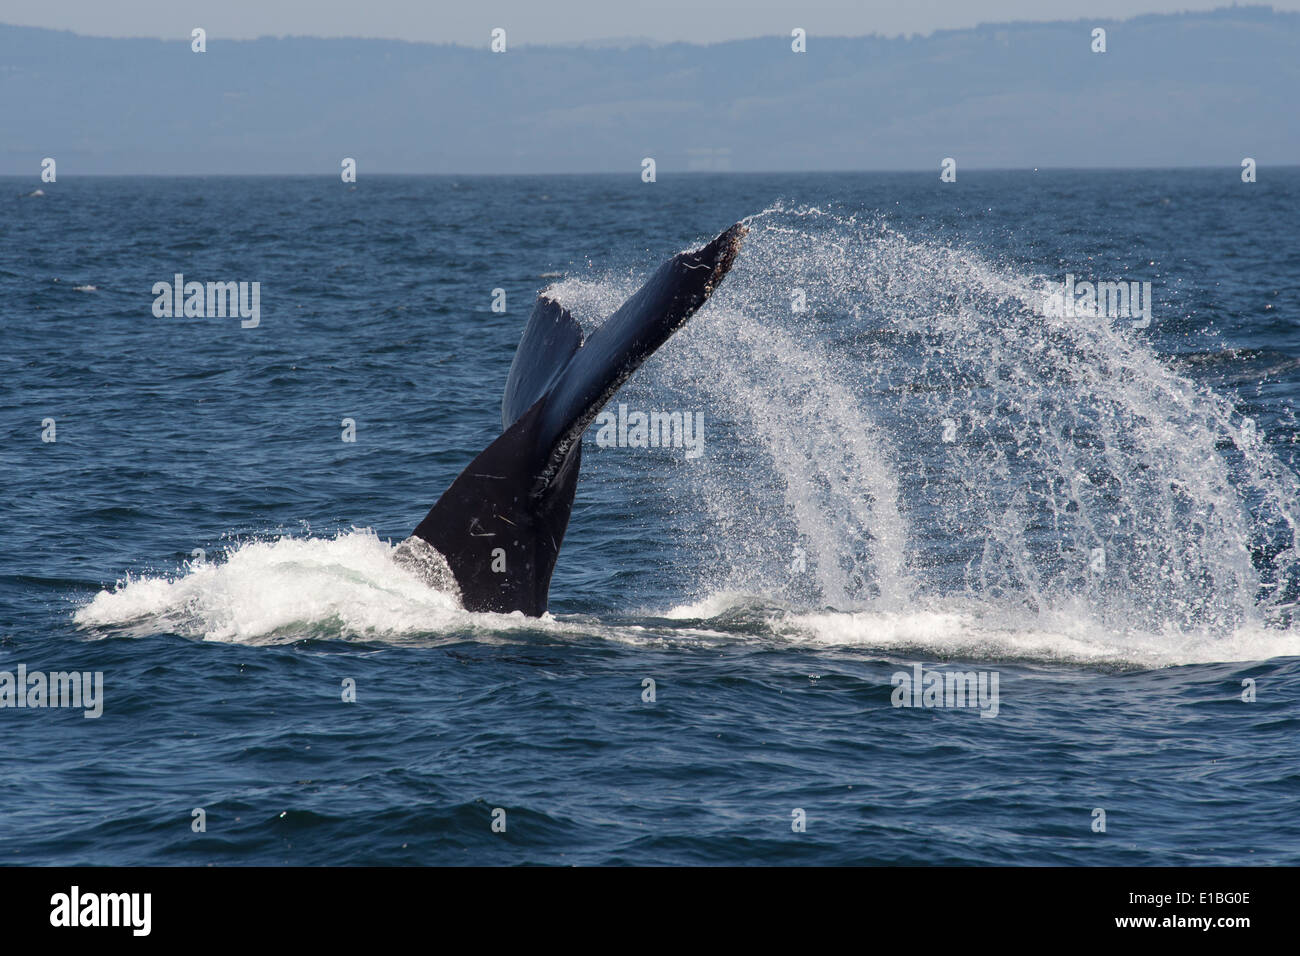 Humpback Whale (Megaptera novaeangliae) lob-tailing. Monterey, California, Pacific Ocean. - Stock Image